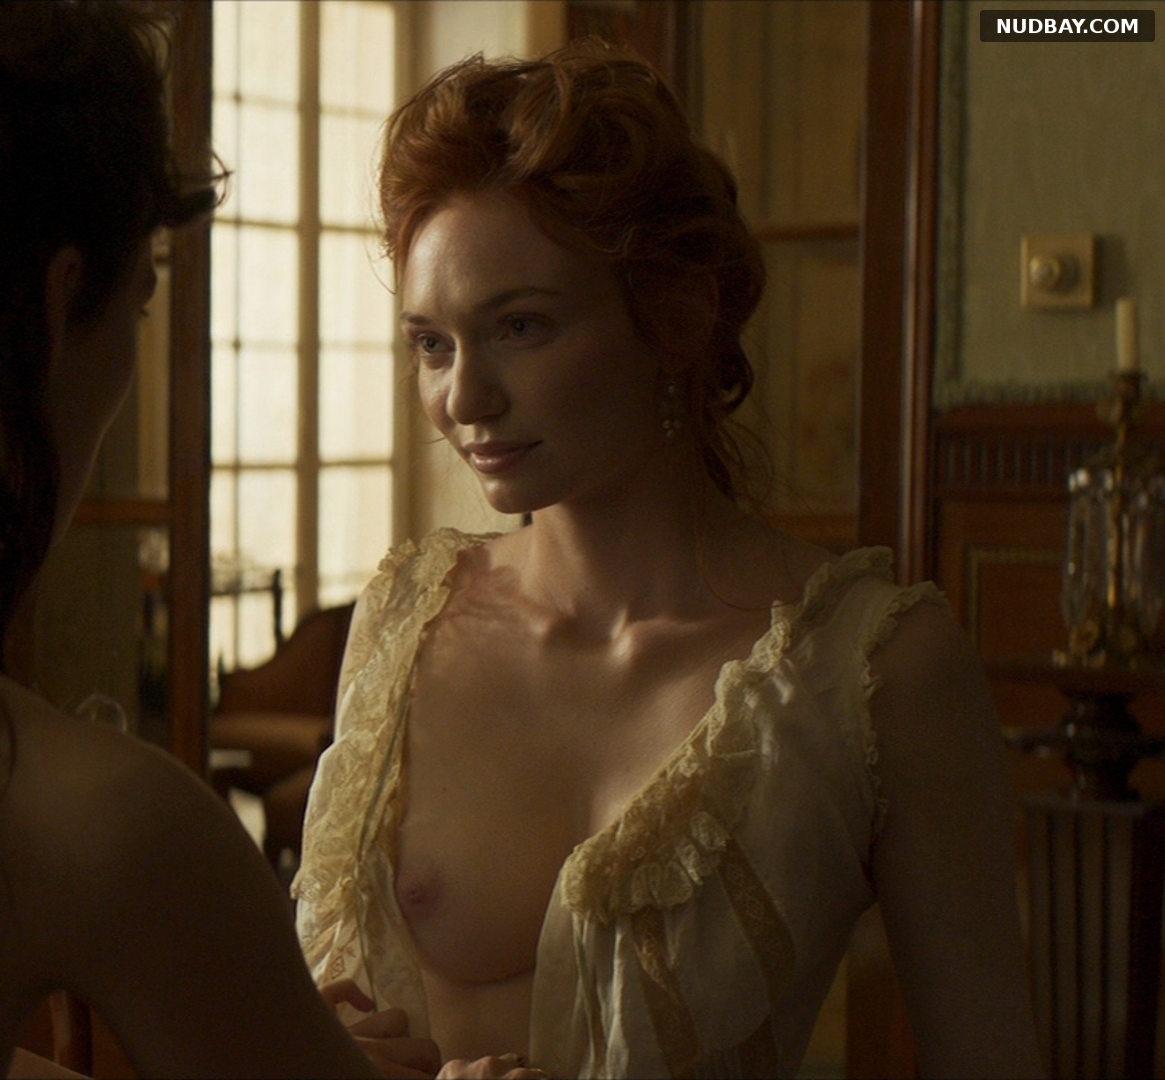 Eleanor Tomlinson nude in the movie Colette (2018)